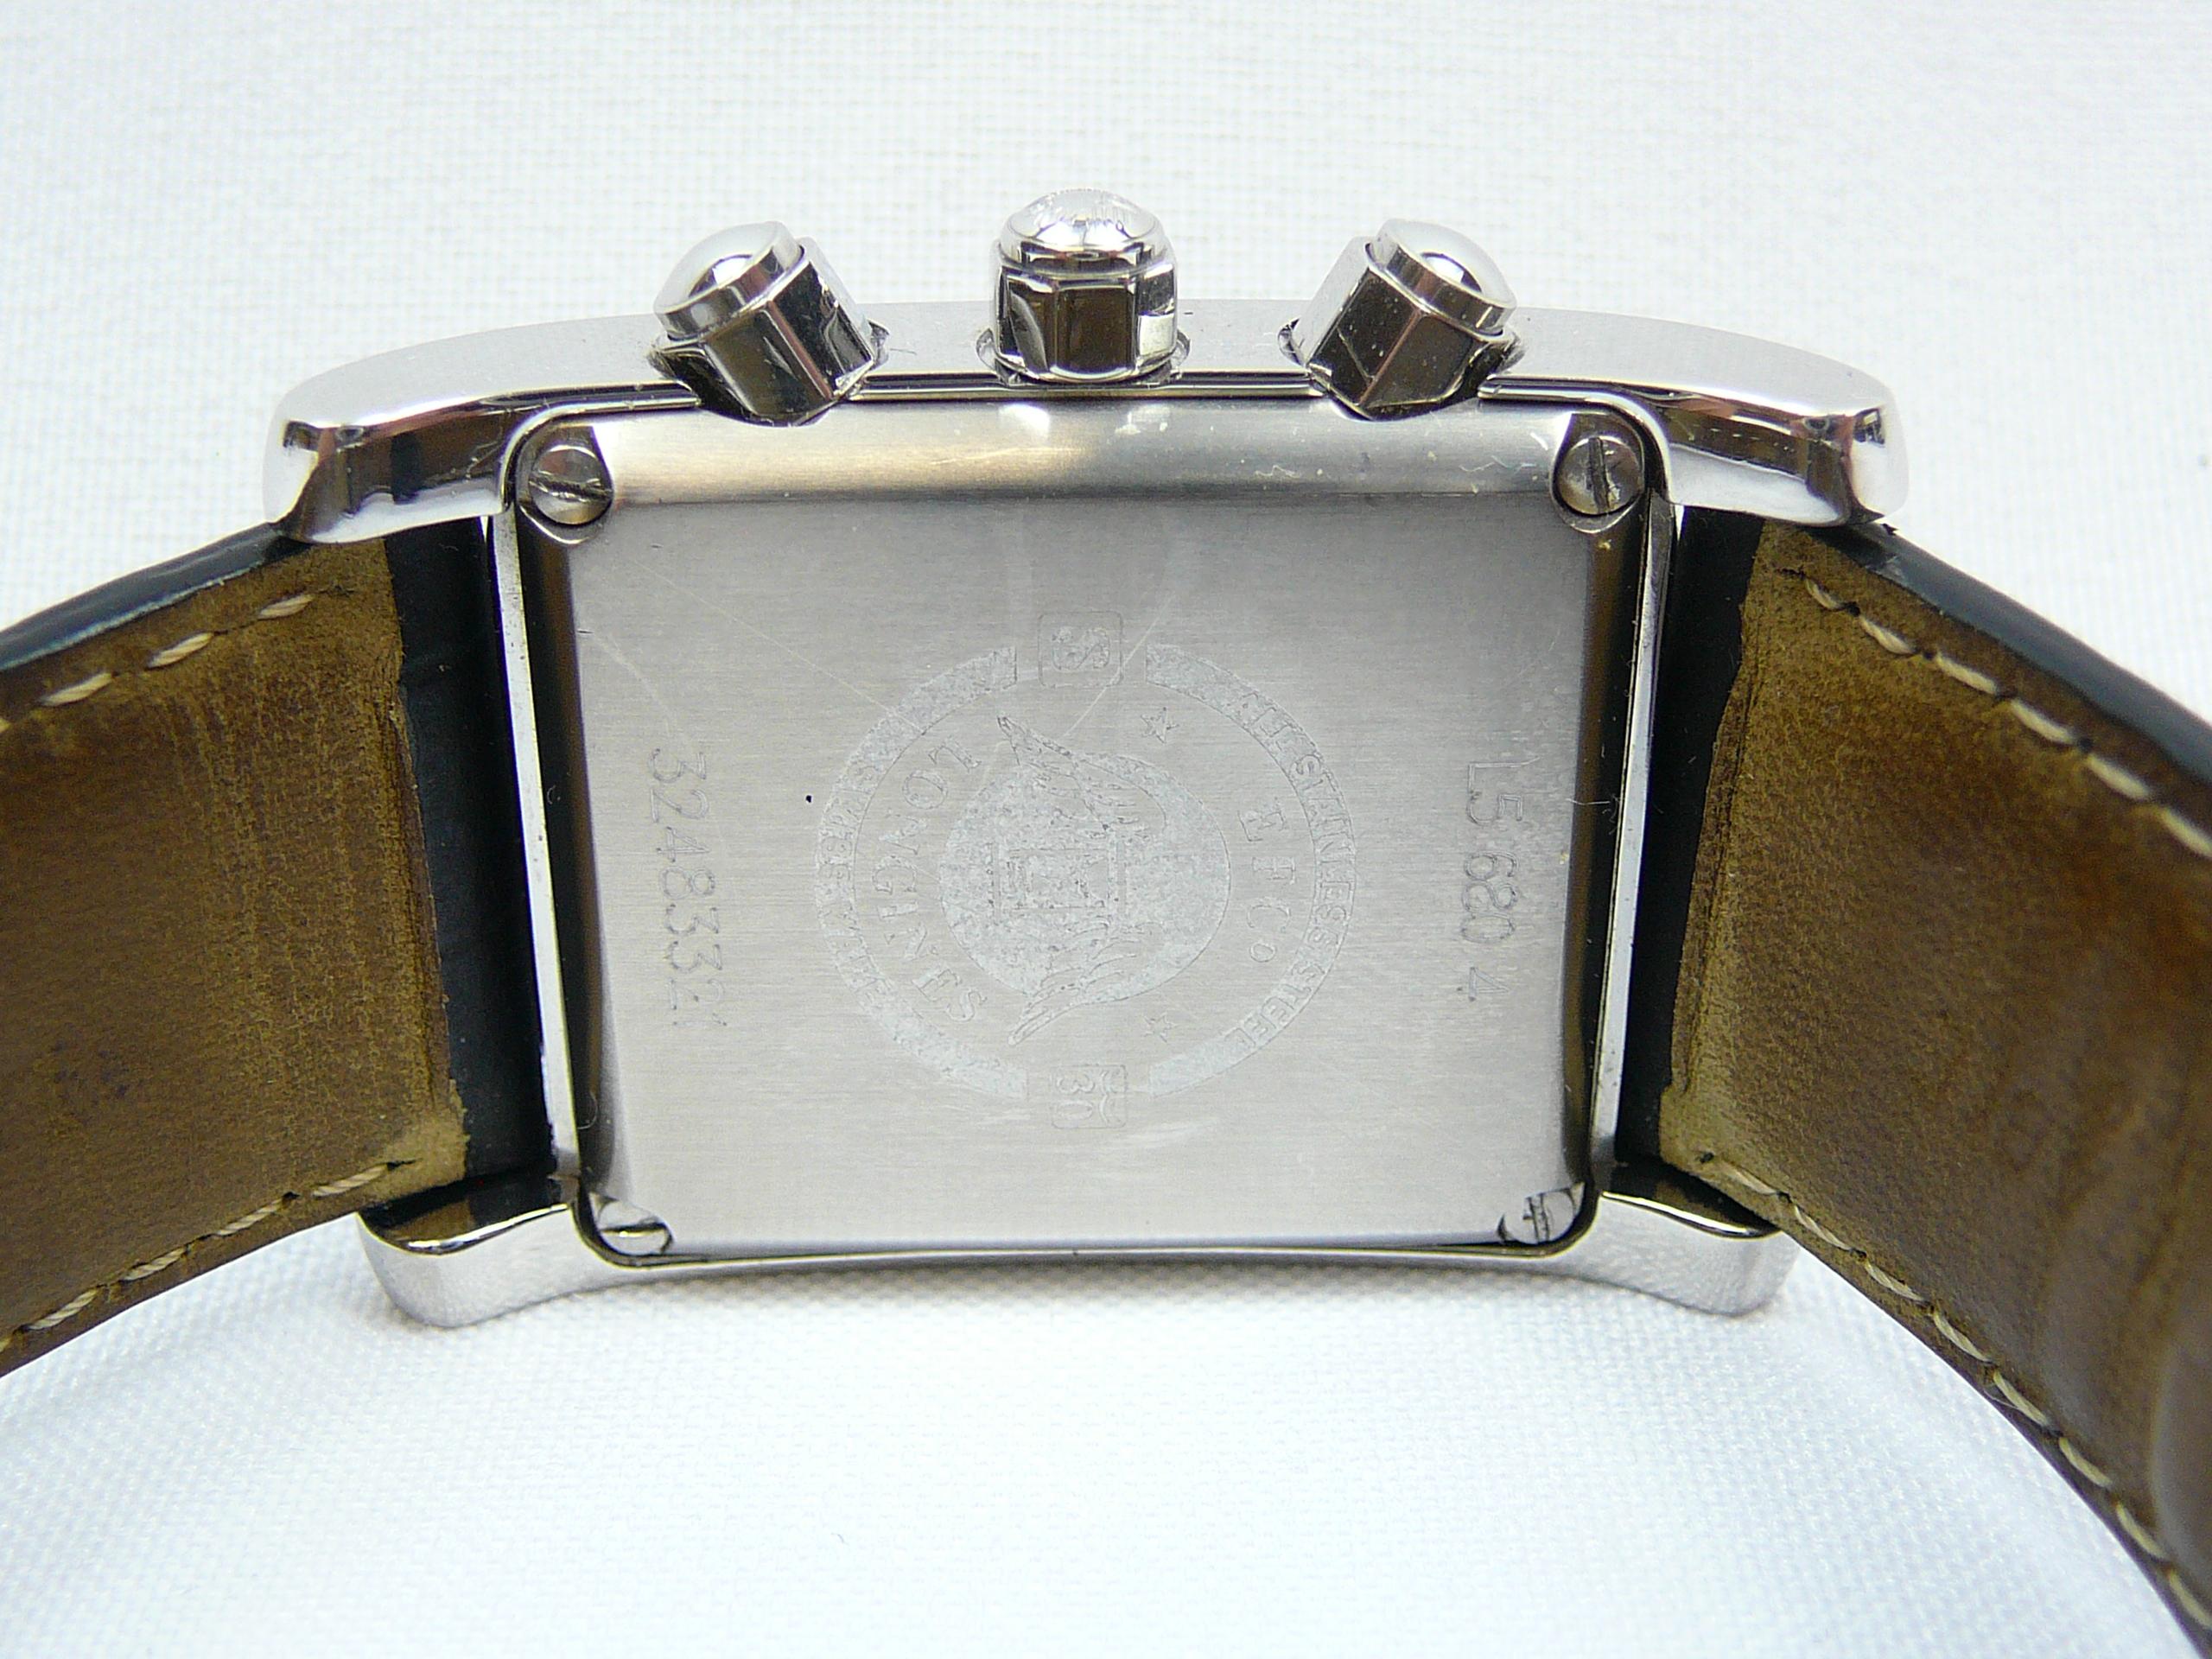 Gents Longines Wrist Watch - Image 4 of 4